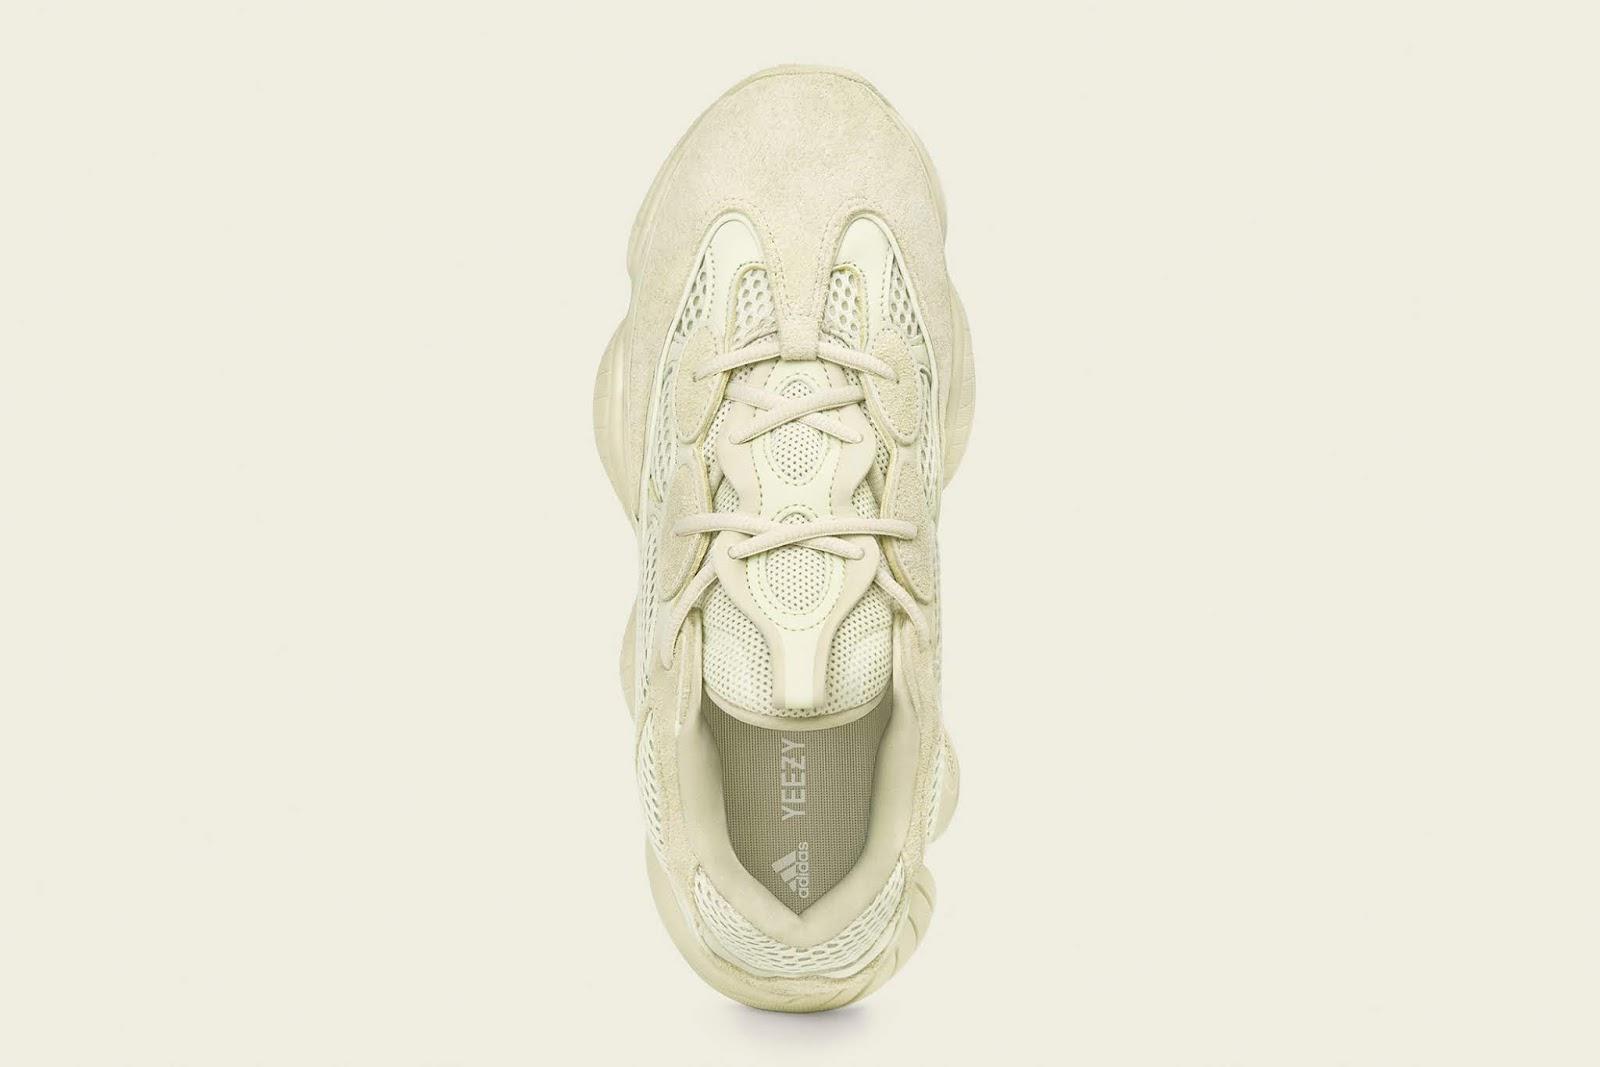 bea86255d0c63 Swag Craze  First Look  adidas Yeezy 500  Super Moon Yellow